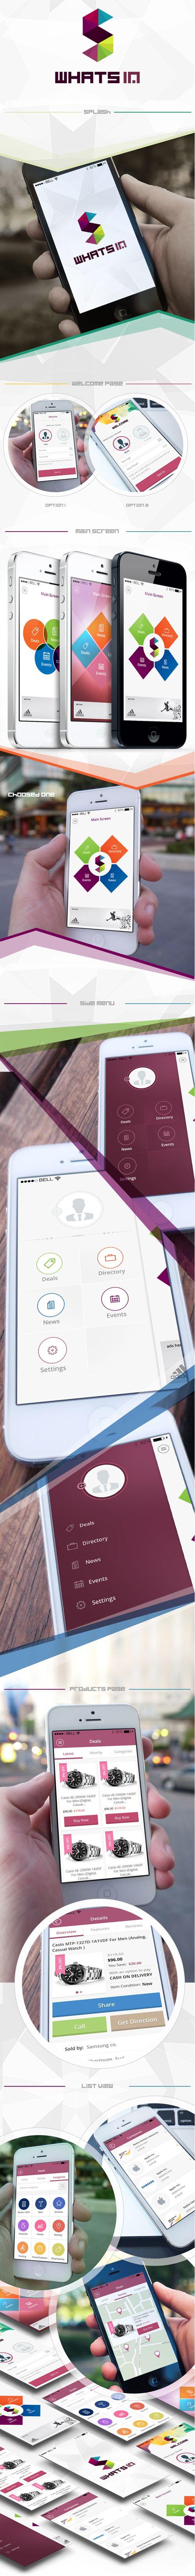 Amazing Mobile App UI Designs with Ultimate User Experience - 41 #uidesign #uxdesign #mobileappui #UIUX